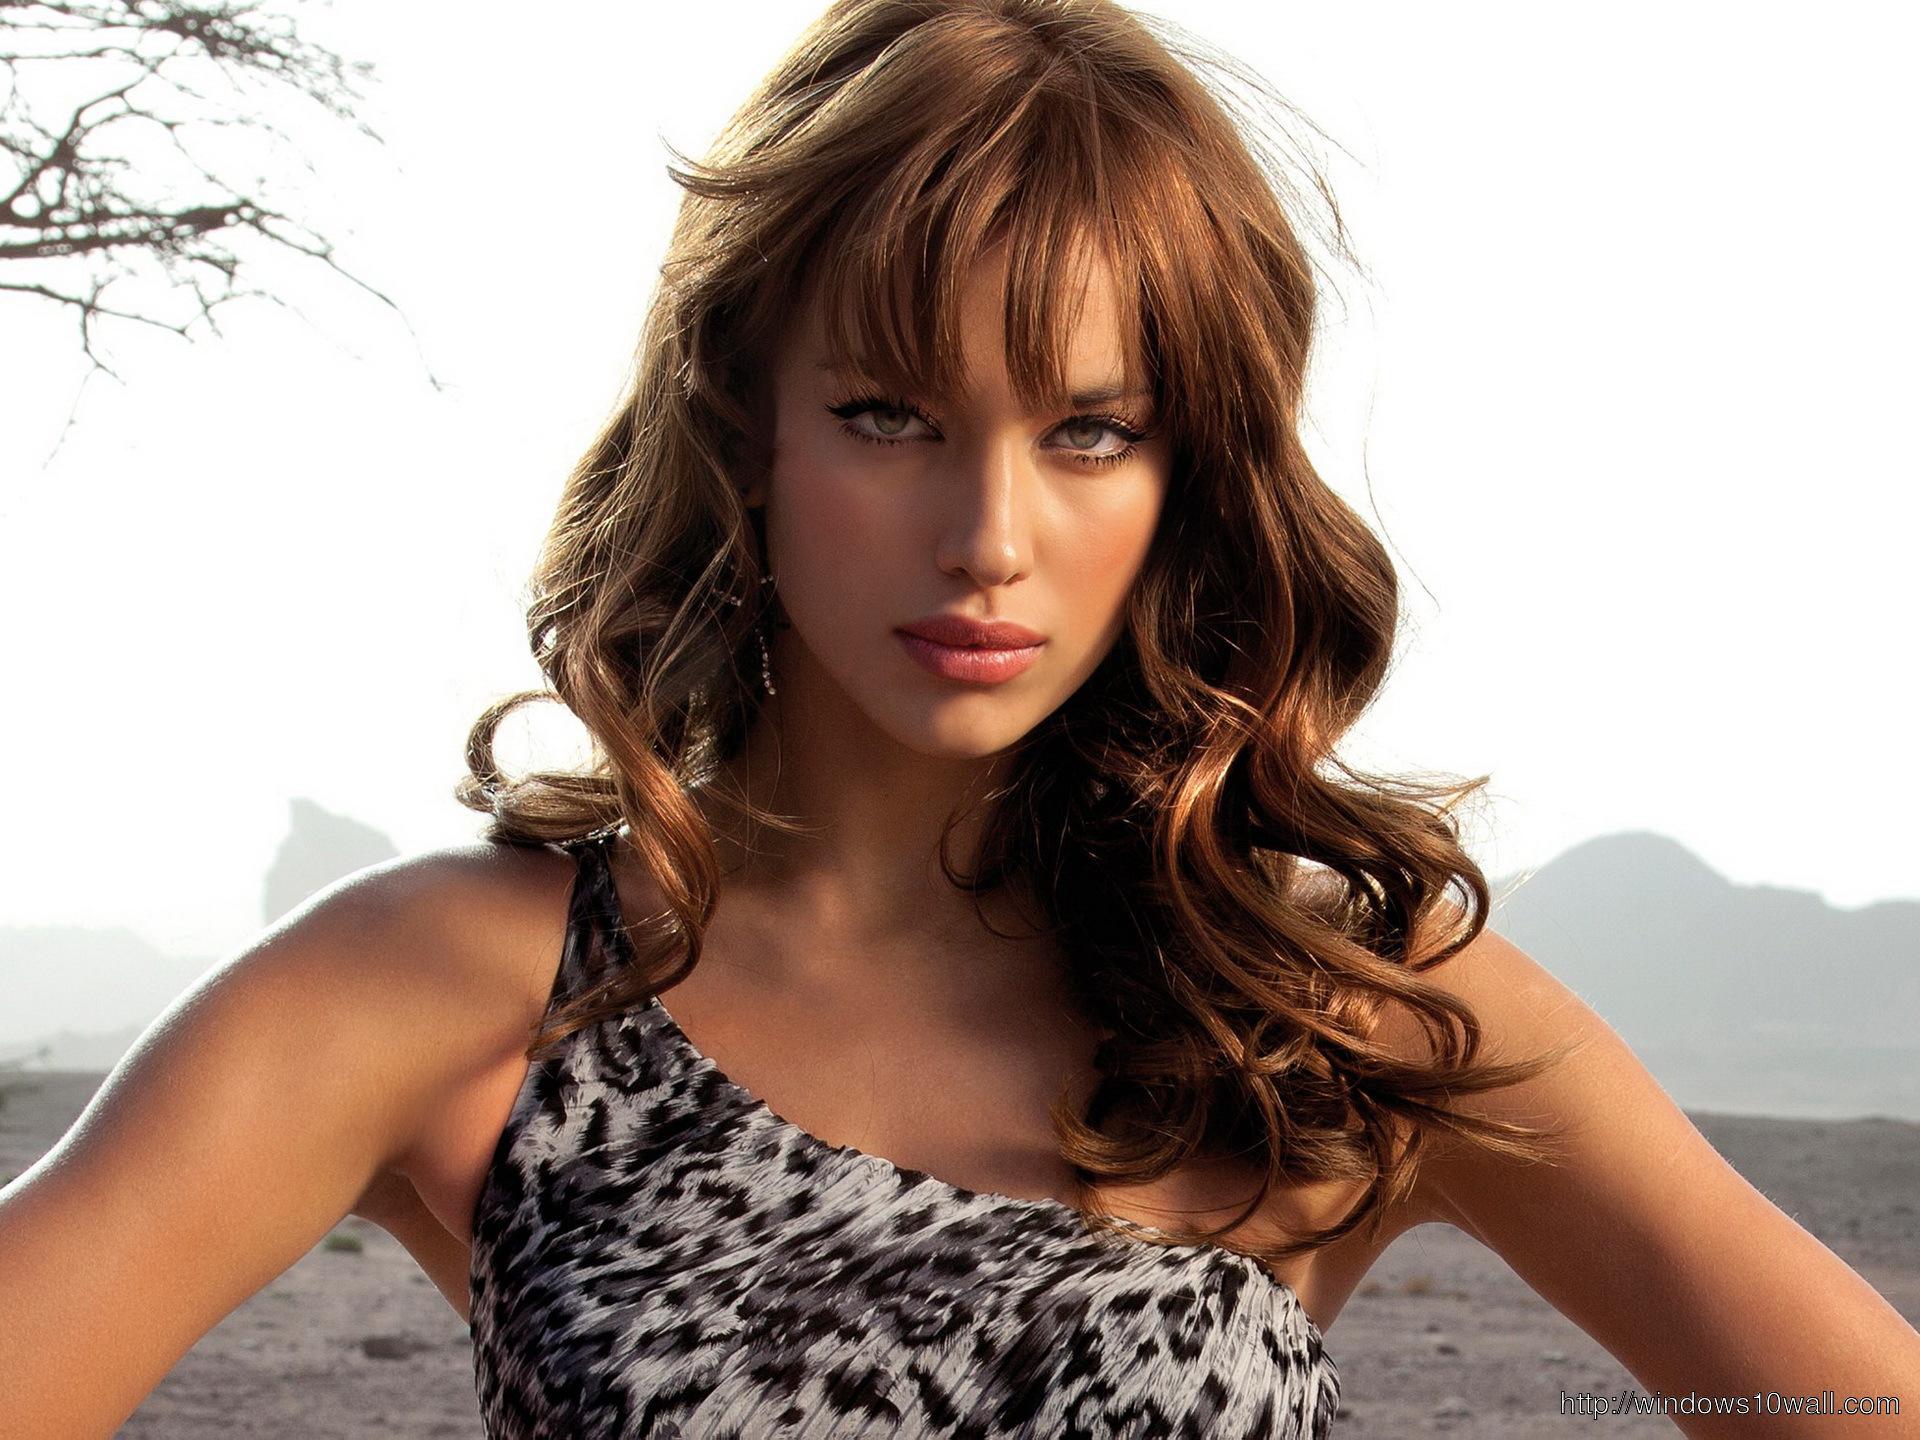 Irina Shayk model Background Wallpaper